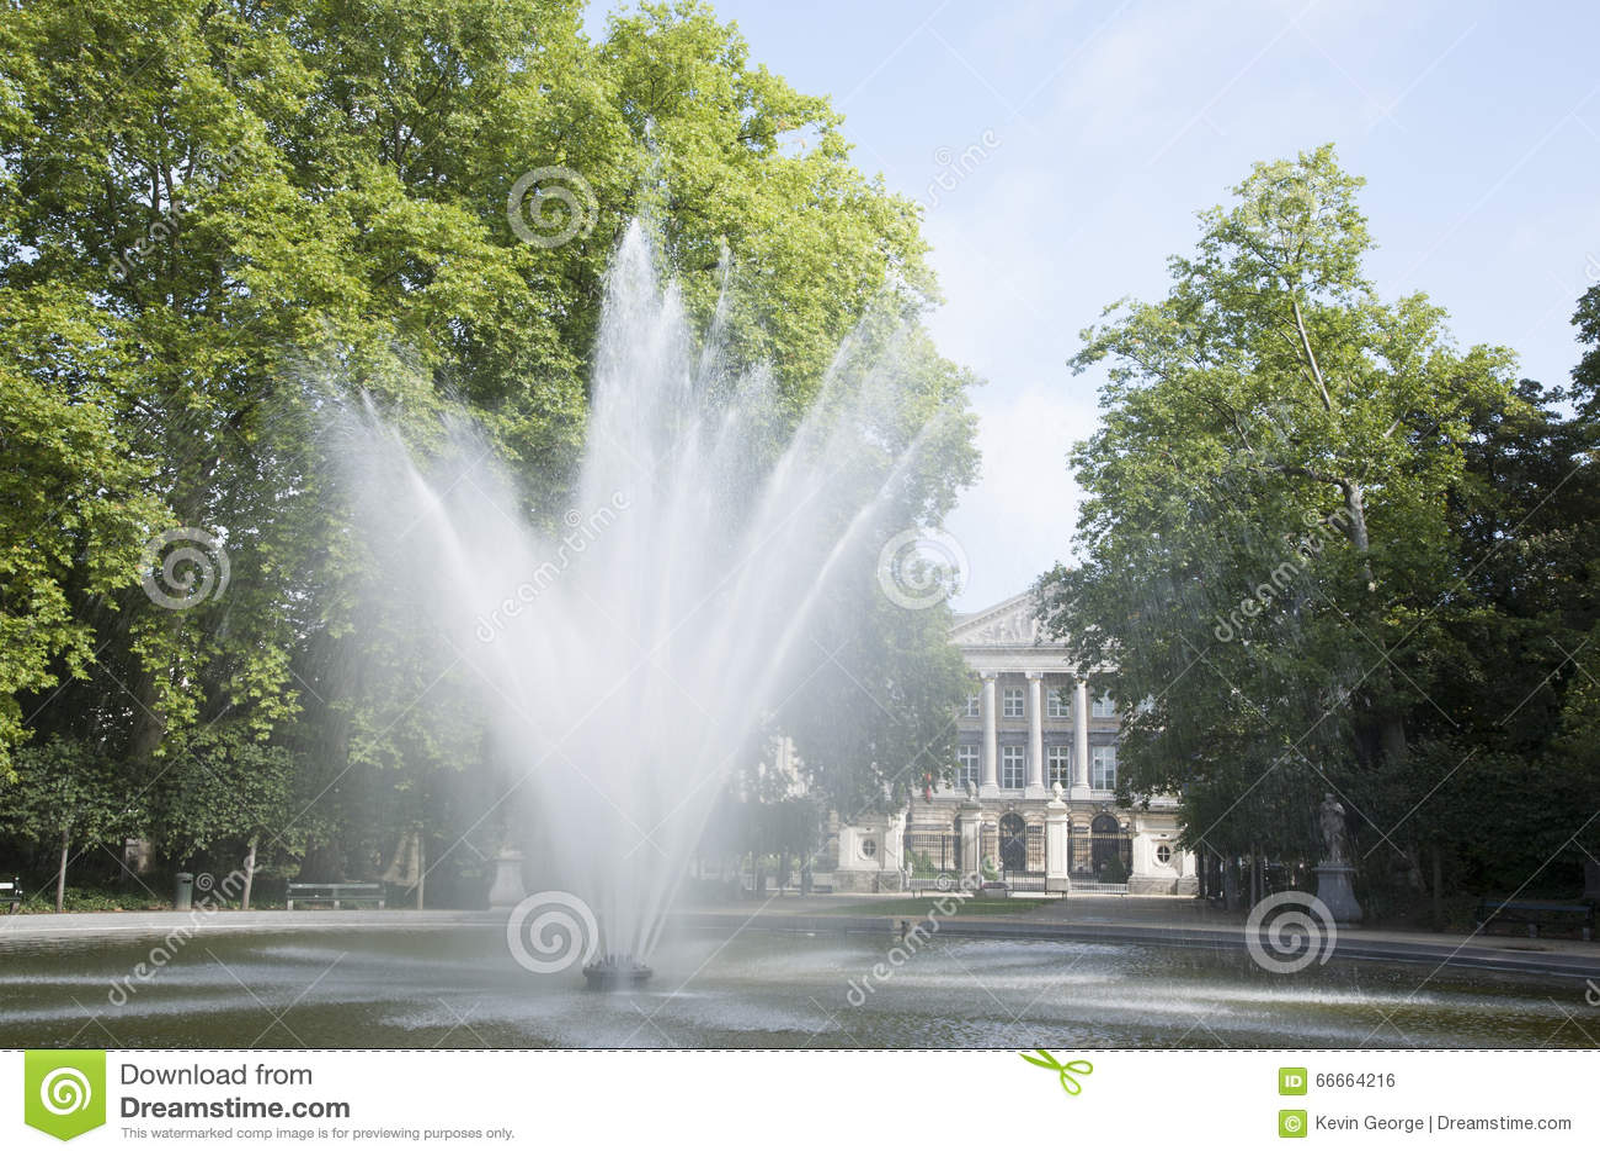 Fountain in Brussels Park - Parc de Bruxelles - Warandepark